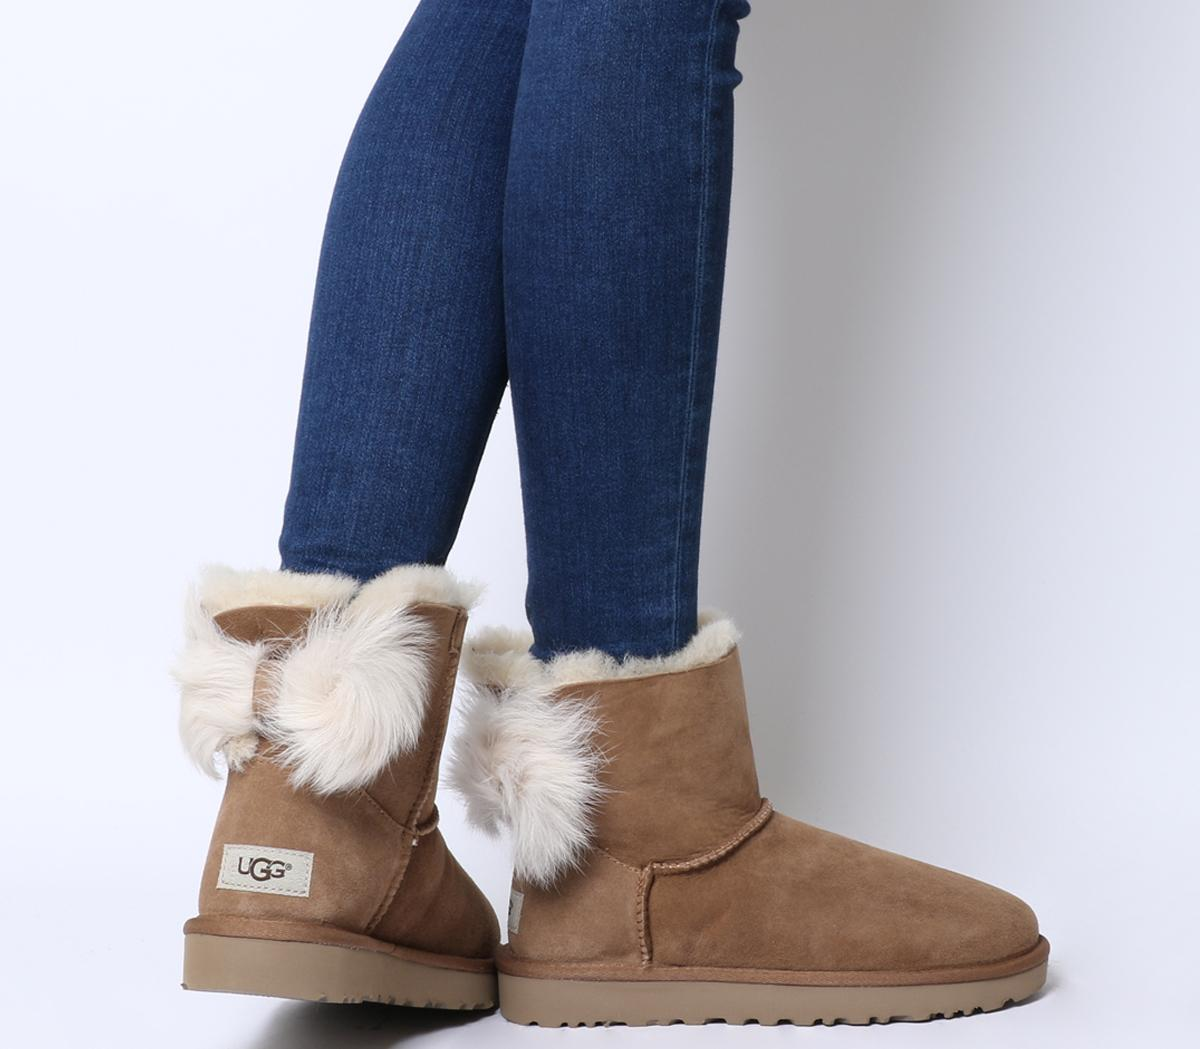 UGG Fluff Bow Mini Boots Chestnut